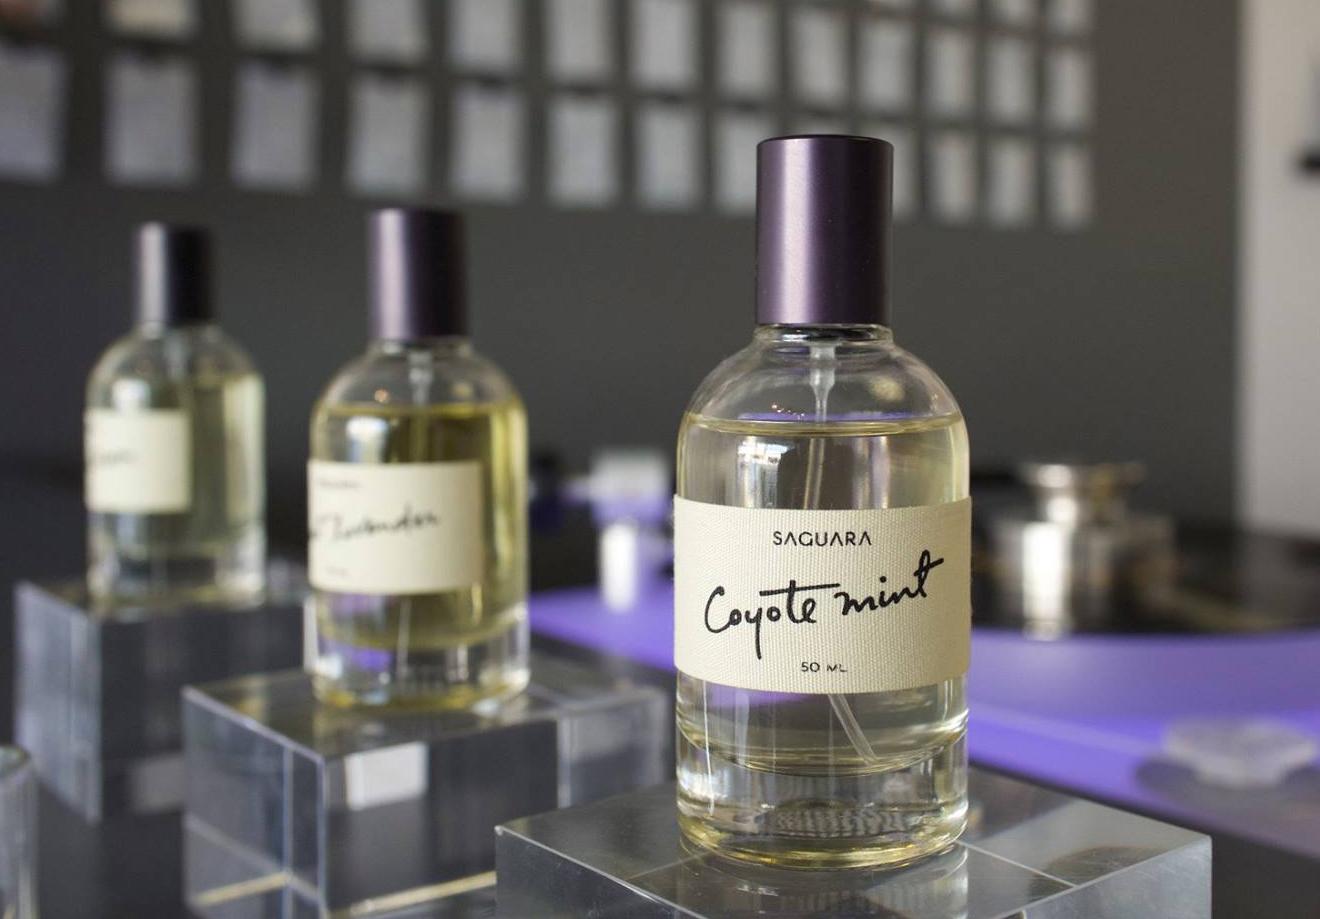 Orris Perfumery Saguara Coyote Mint Perfume